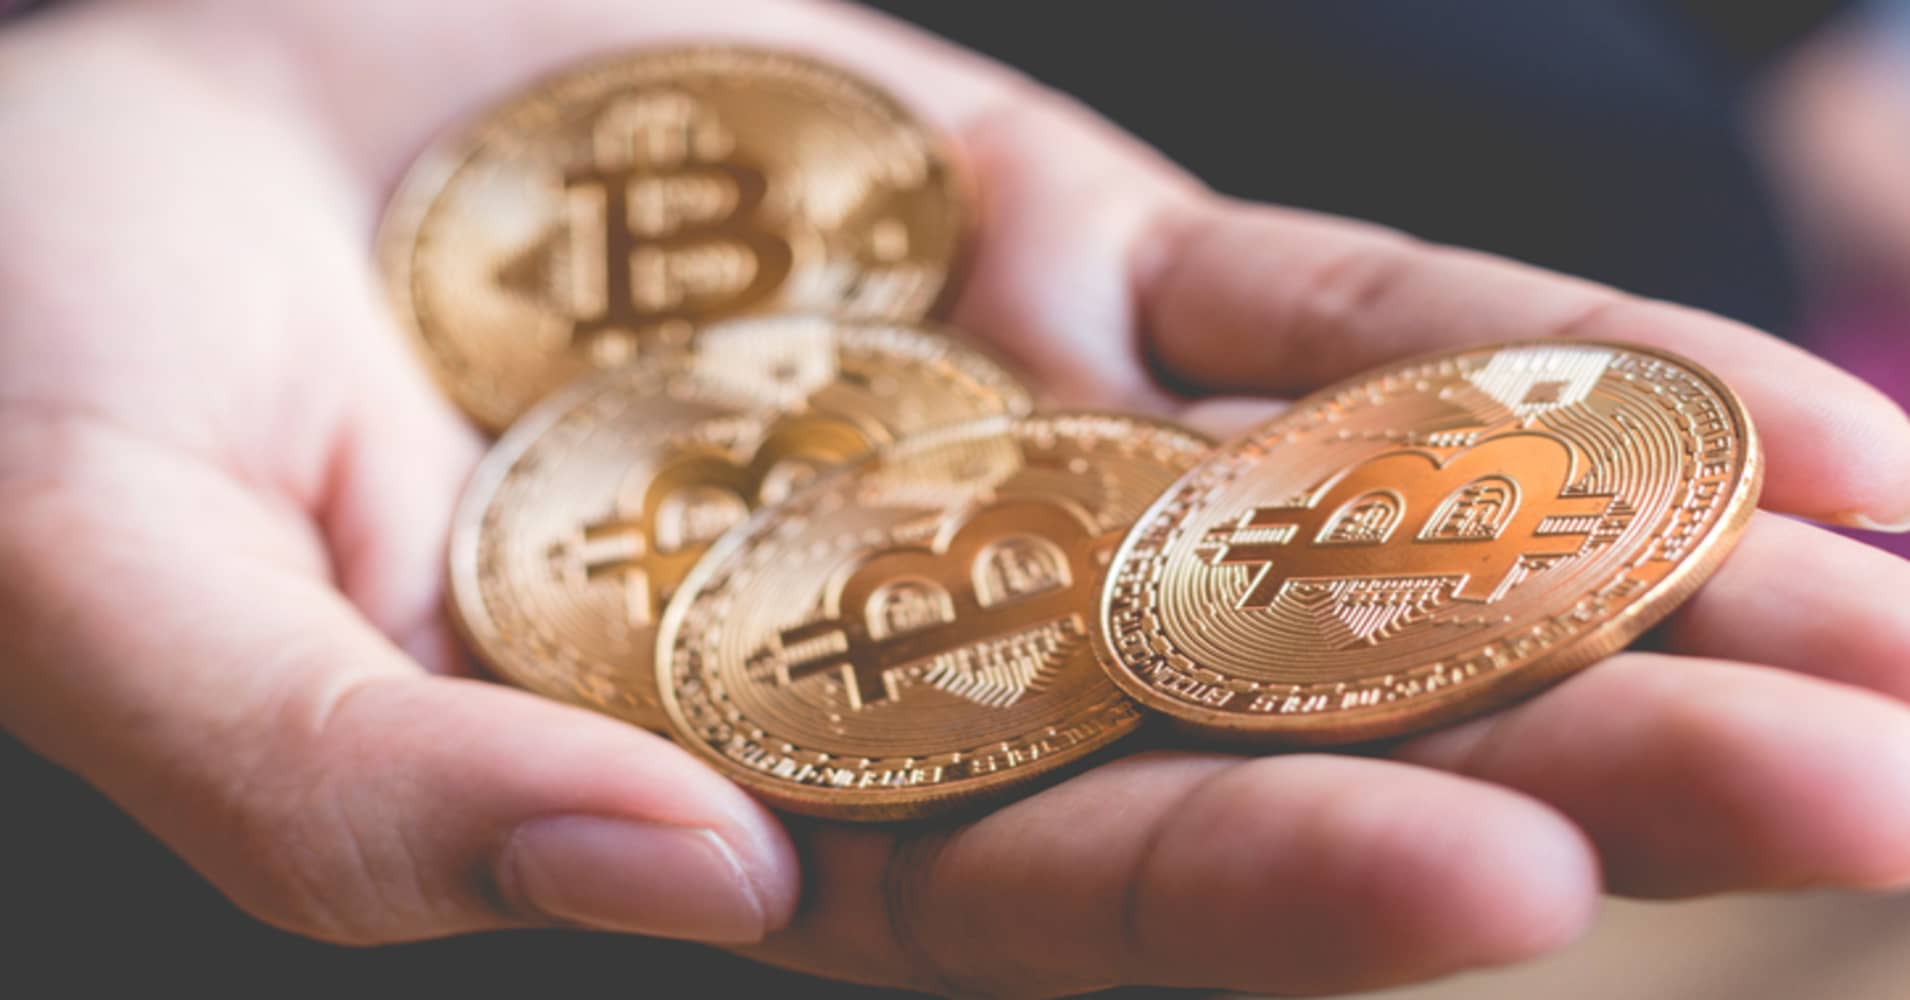 Bitcoin is a non-correlated asset, crypto expert says